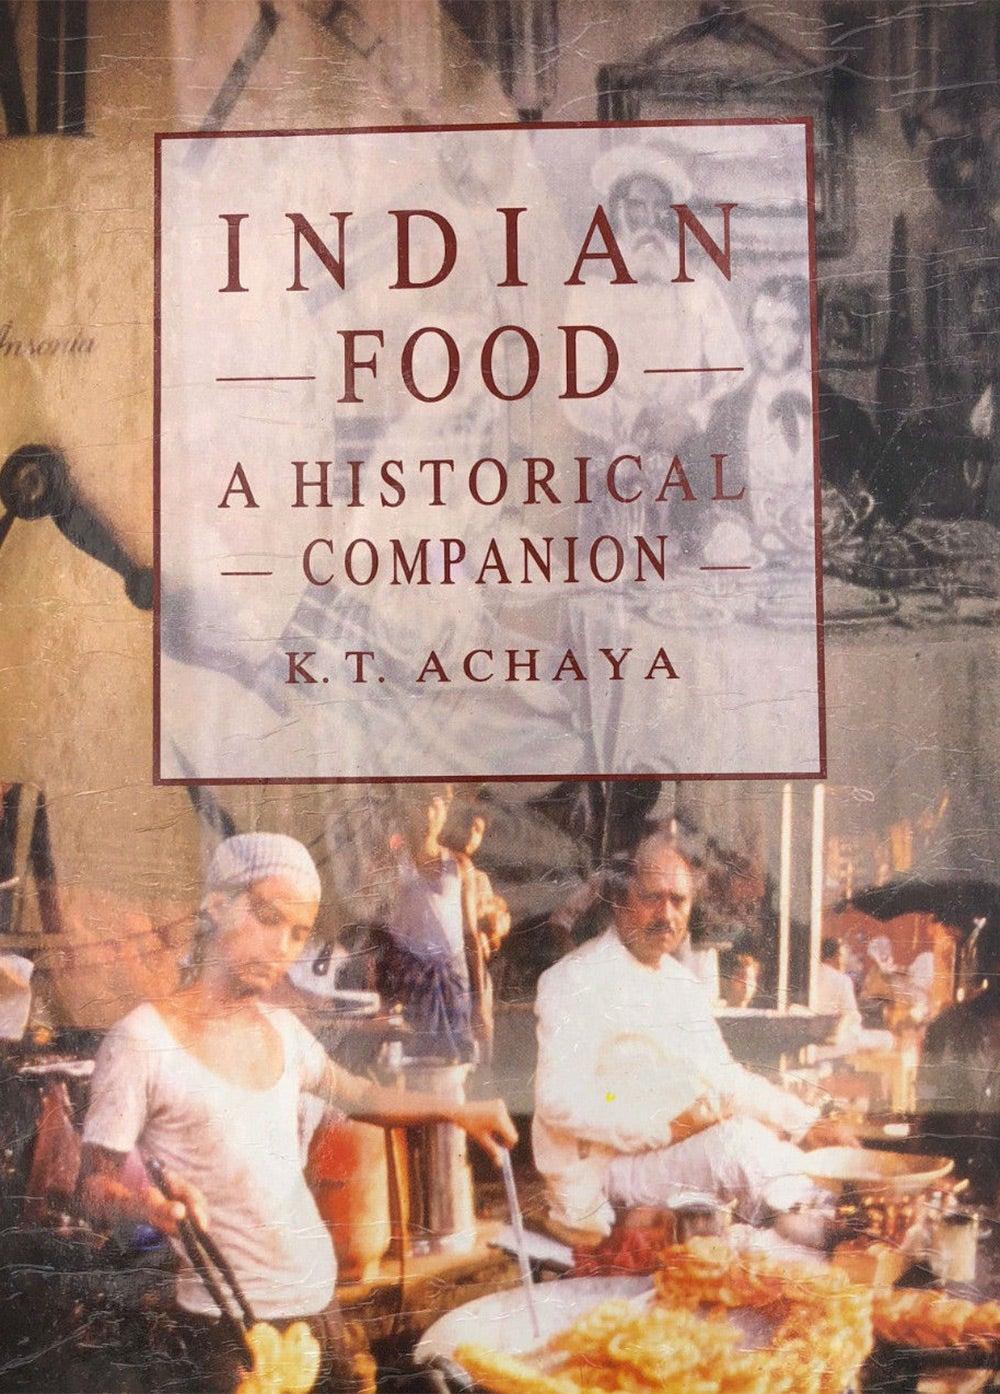 Indian Food, A Historical Companion